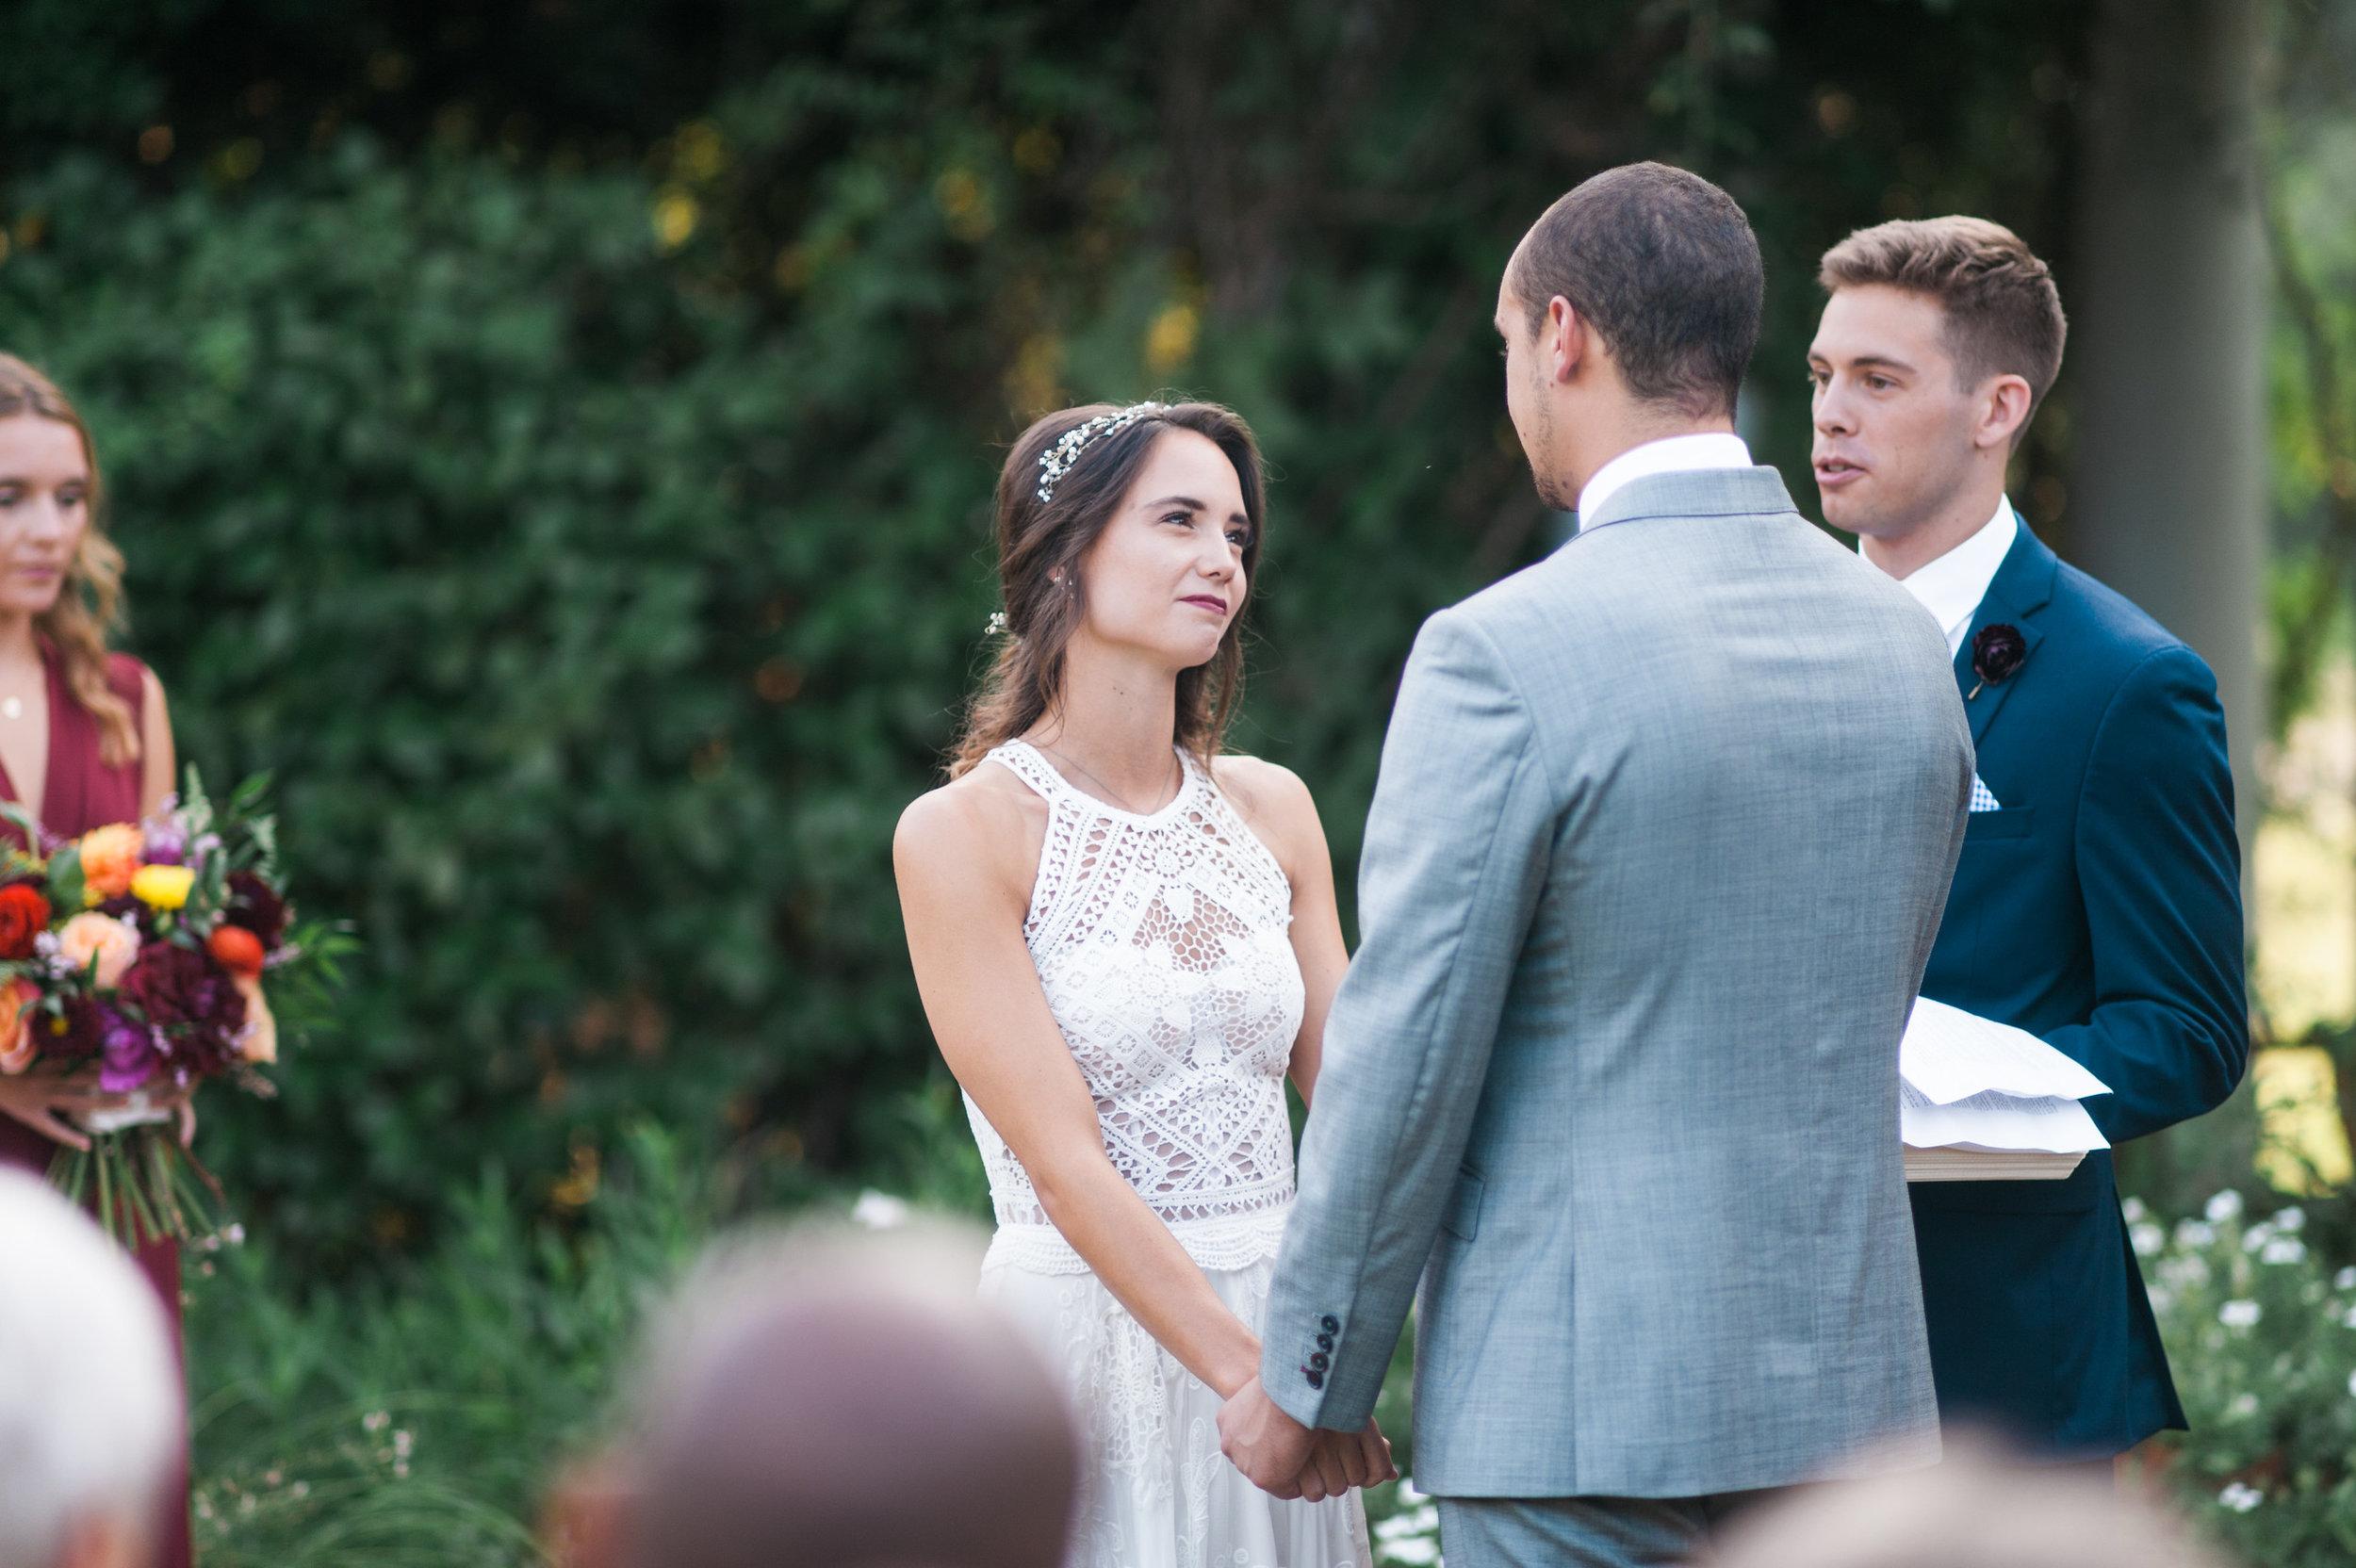 thomas-wedding-197-X5.jpg